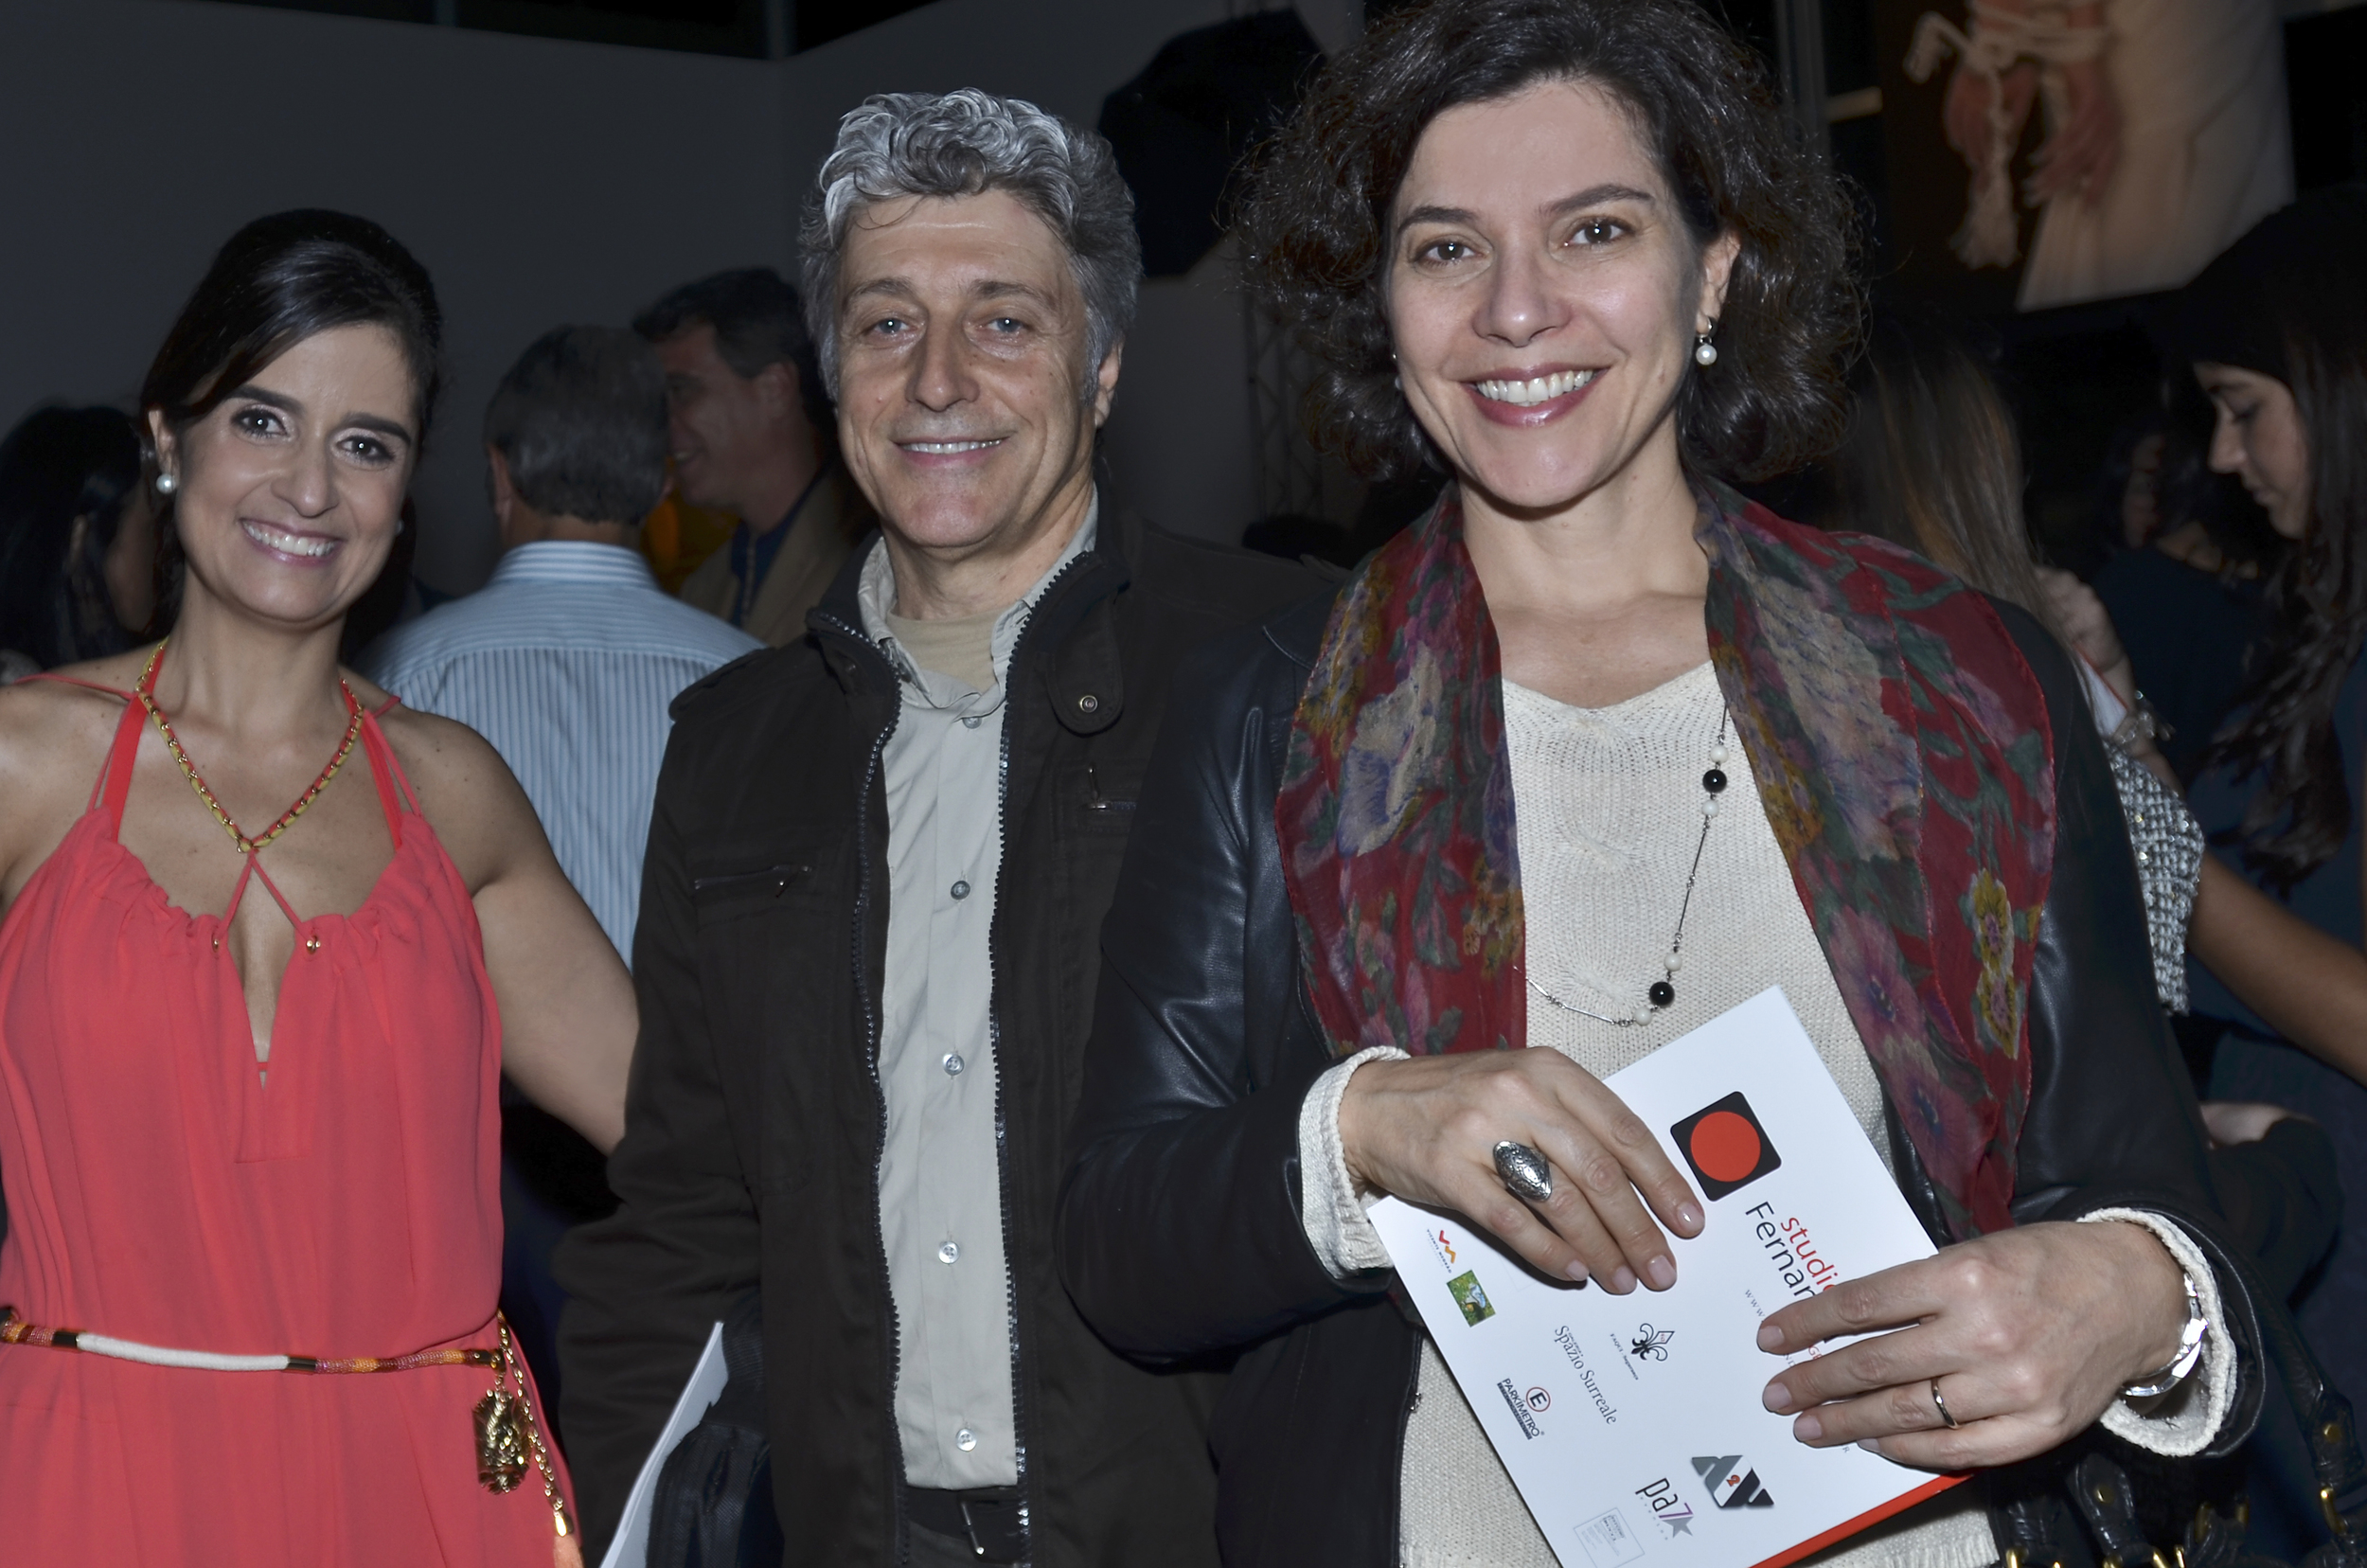 FernandaCalfat_CacoBarcelos(Reporter)_BibiBarcelos001.jpg